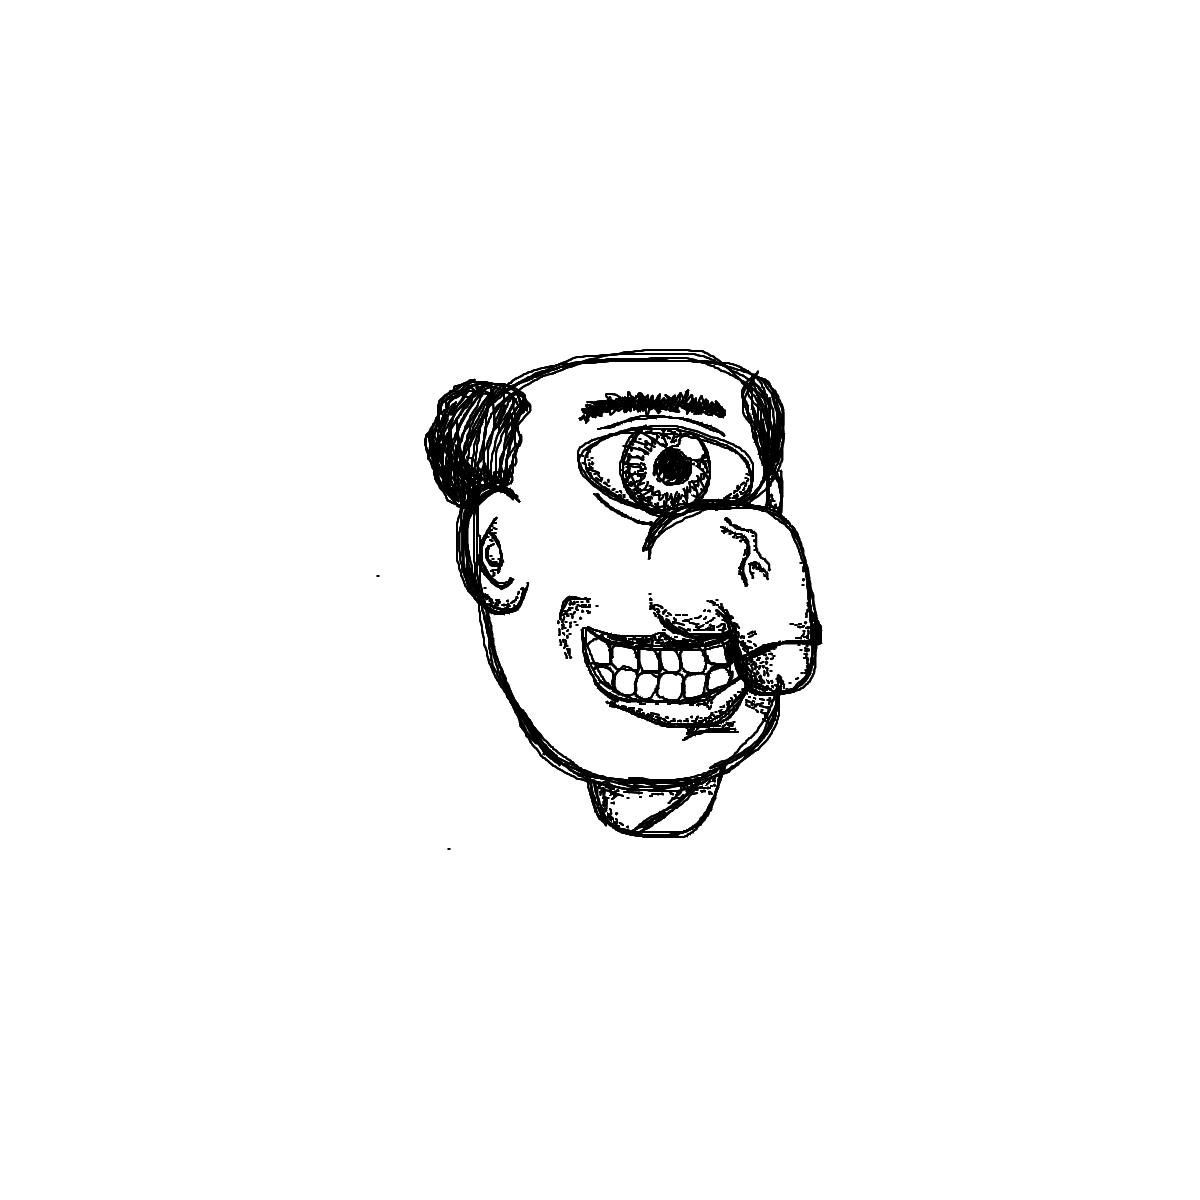 BAAAM drawing#2087 lat:43.3356857299804700lng: -1.9728828668594360